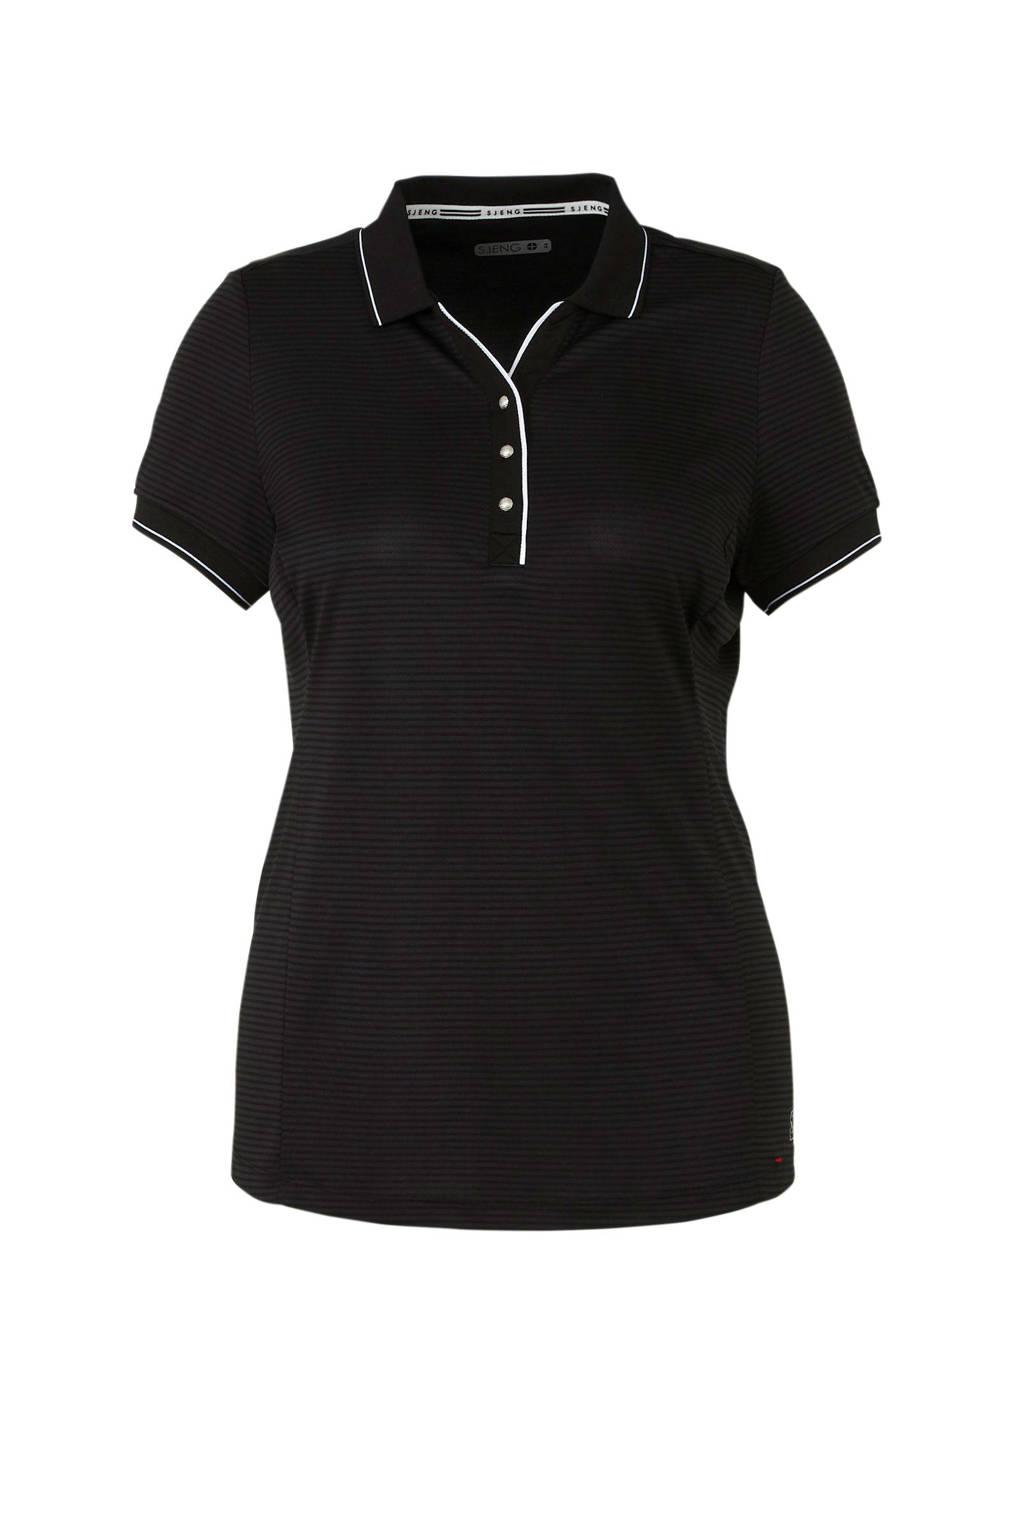 Sjeng Sports Plus polo smalle streep zwart, Antraciet/zwart